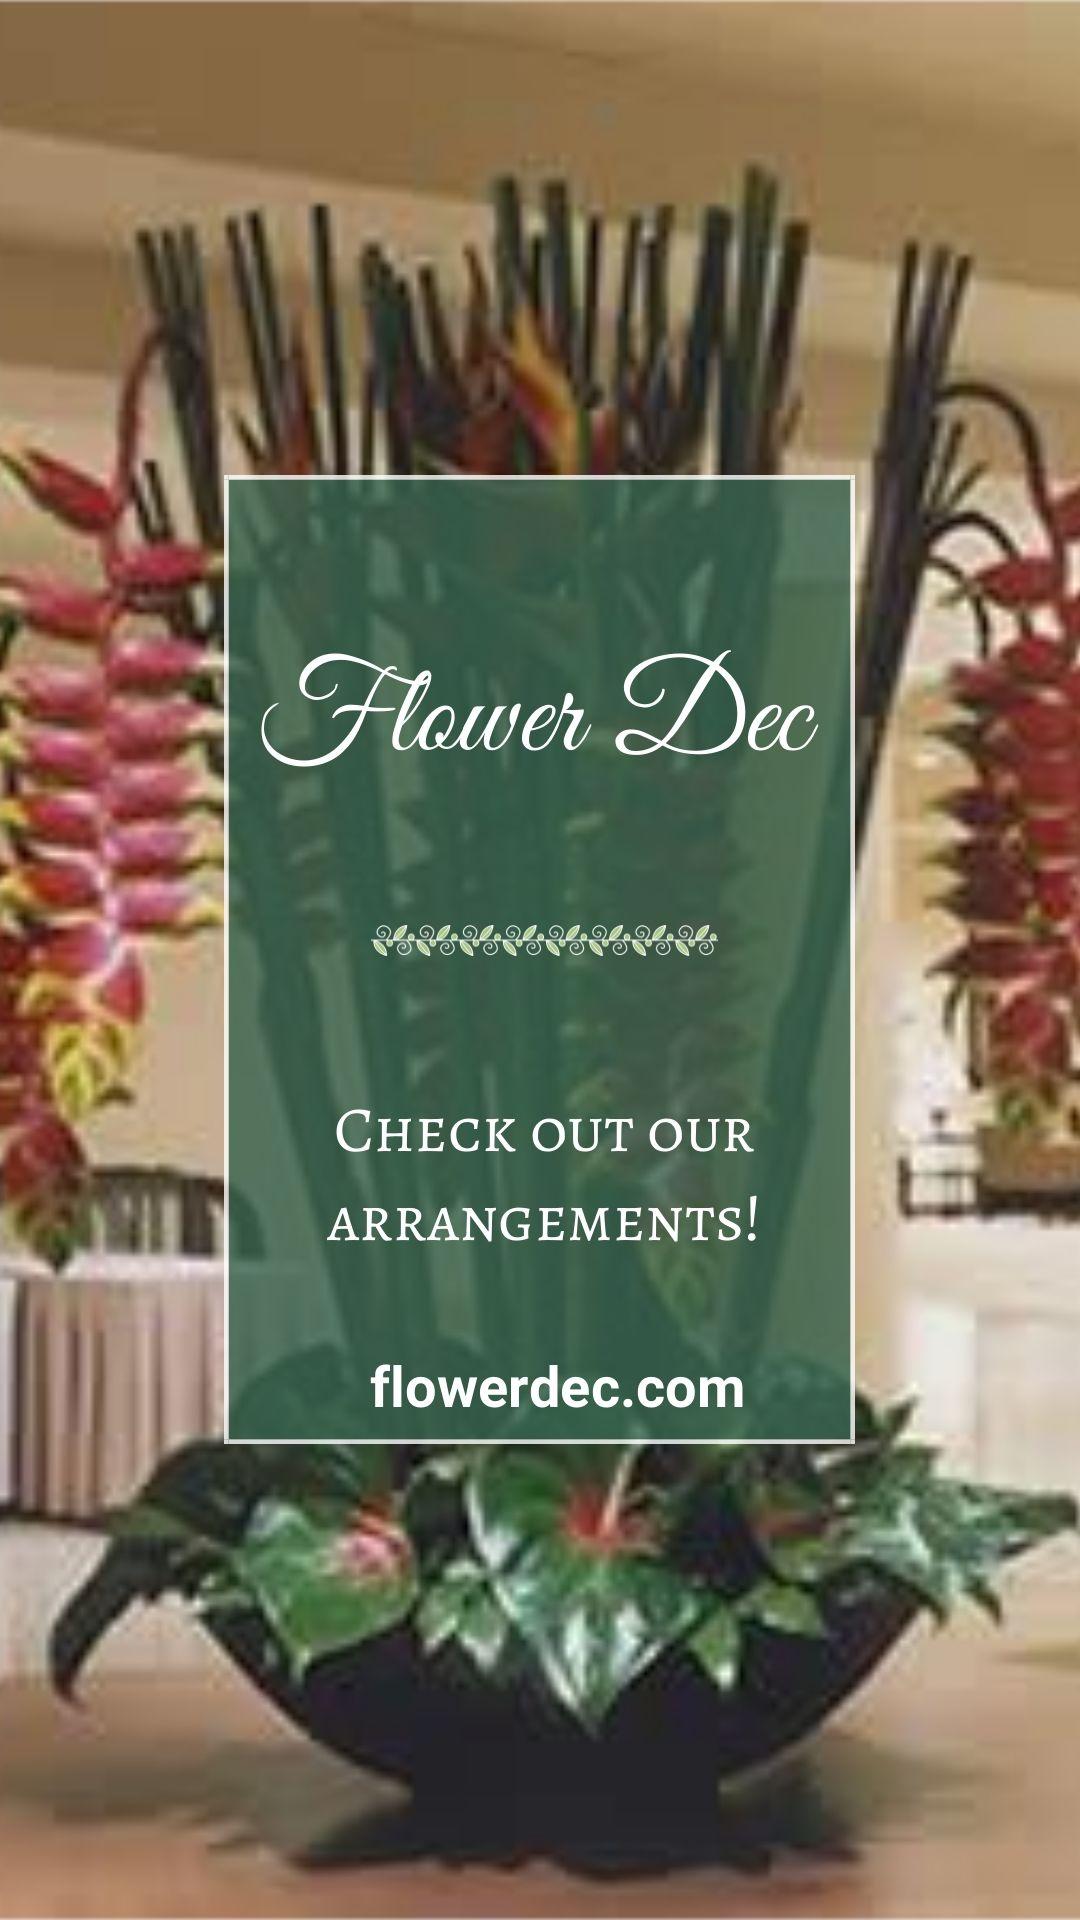 Flower Dec